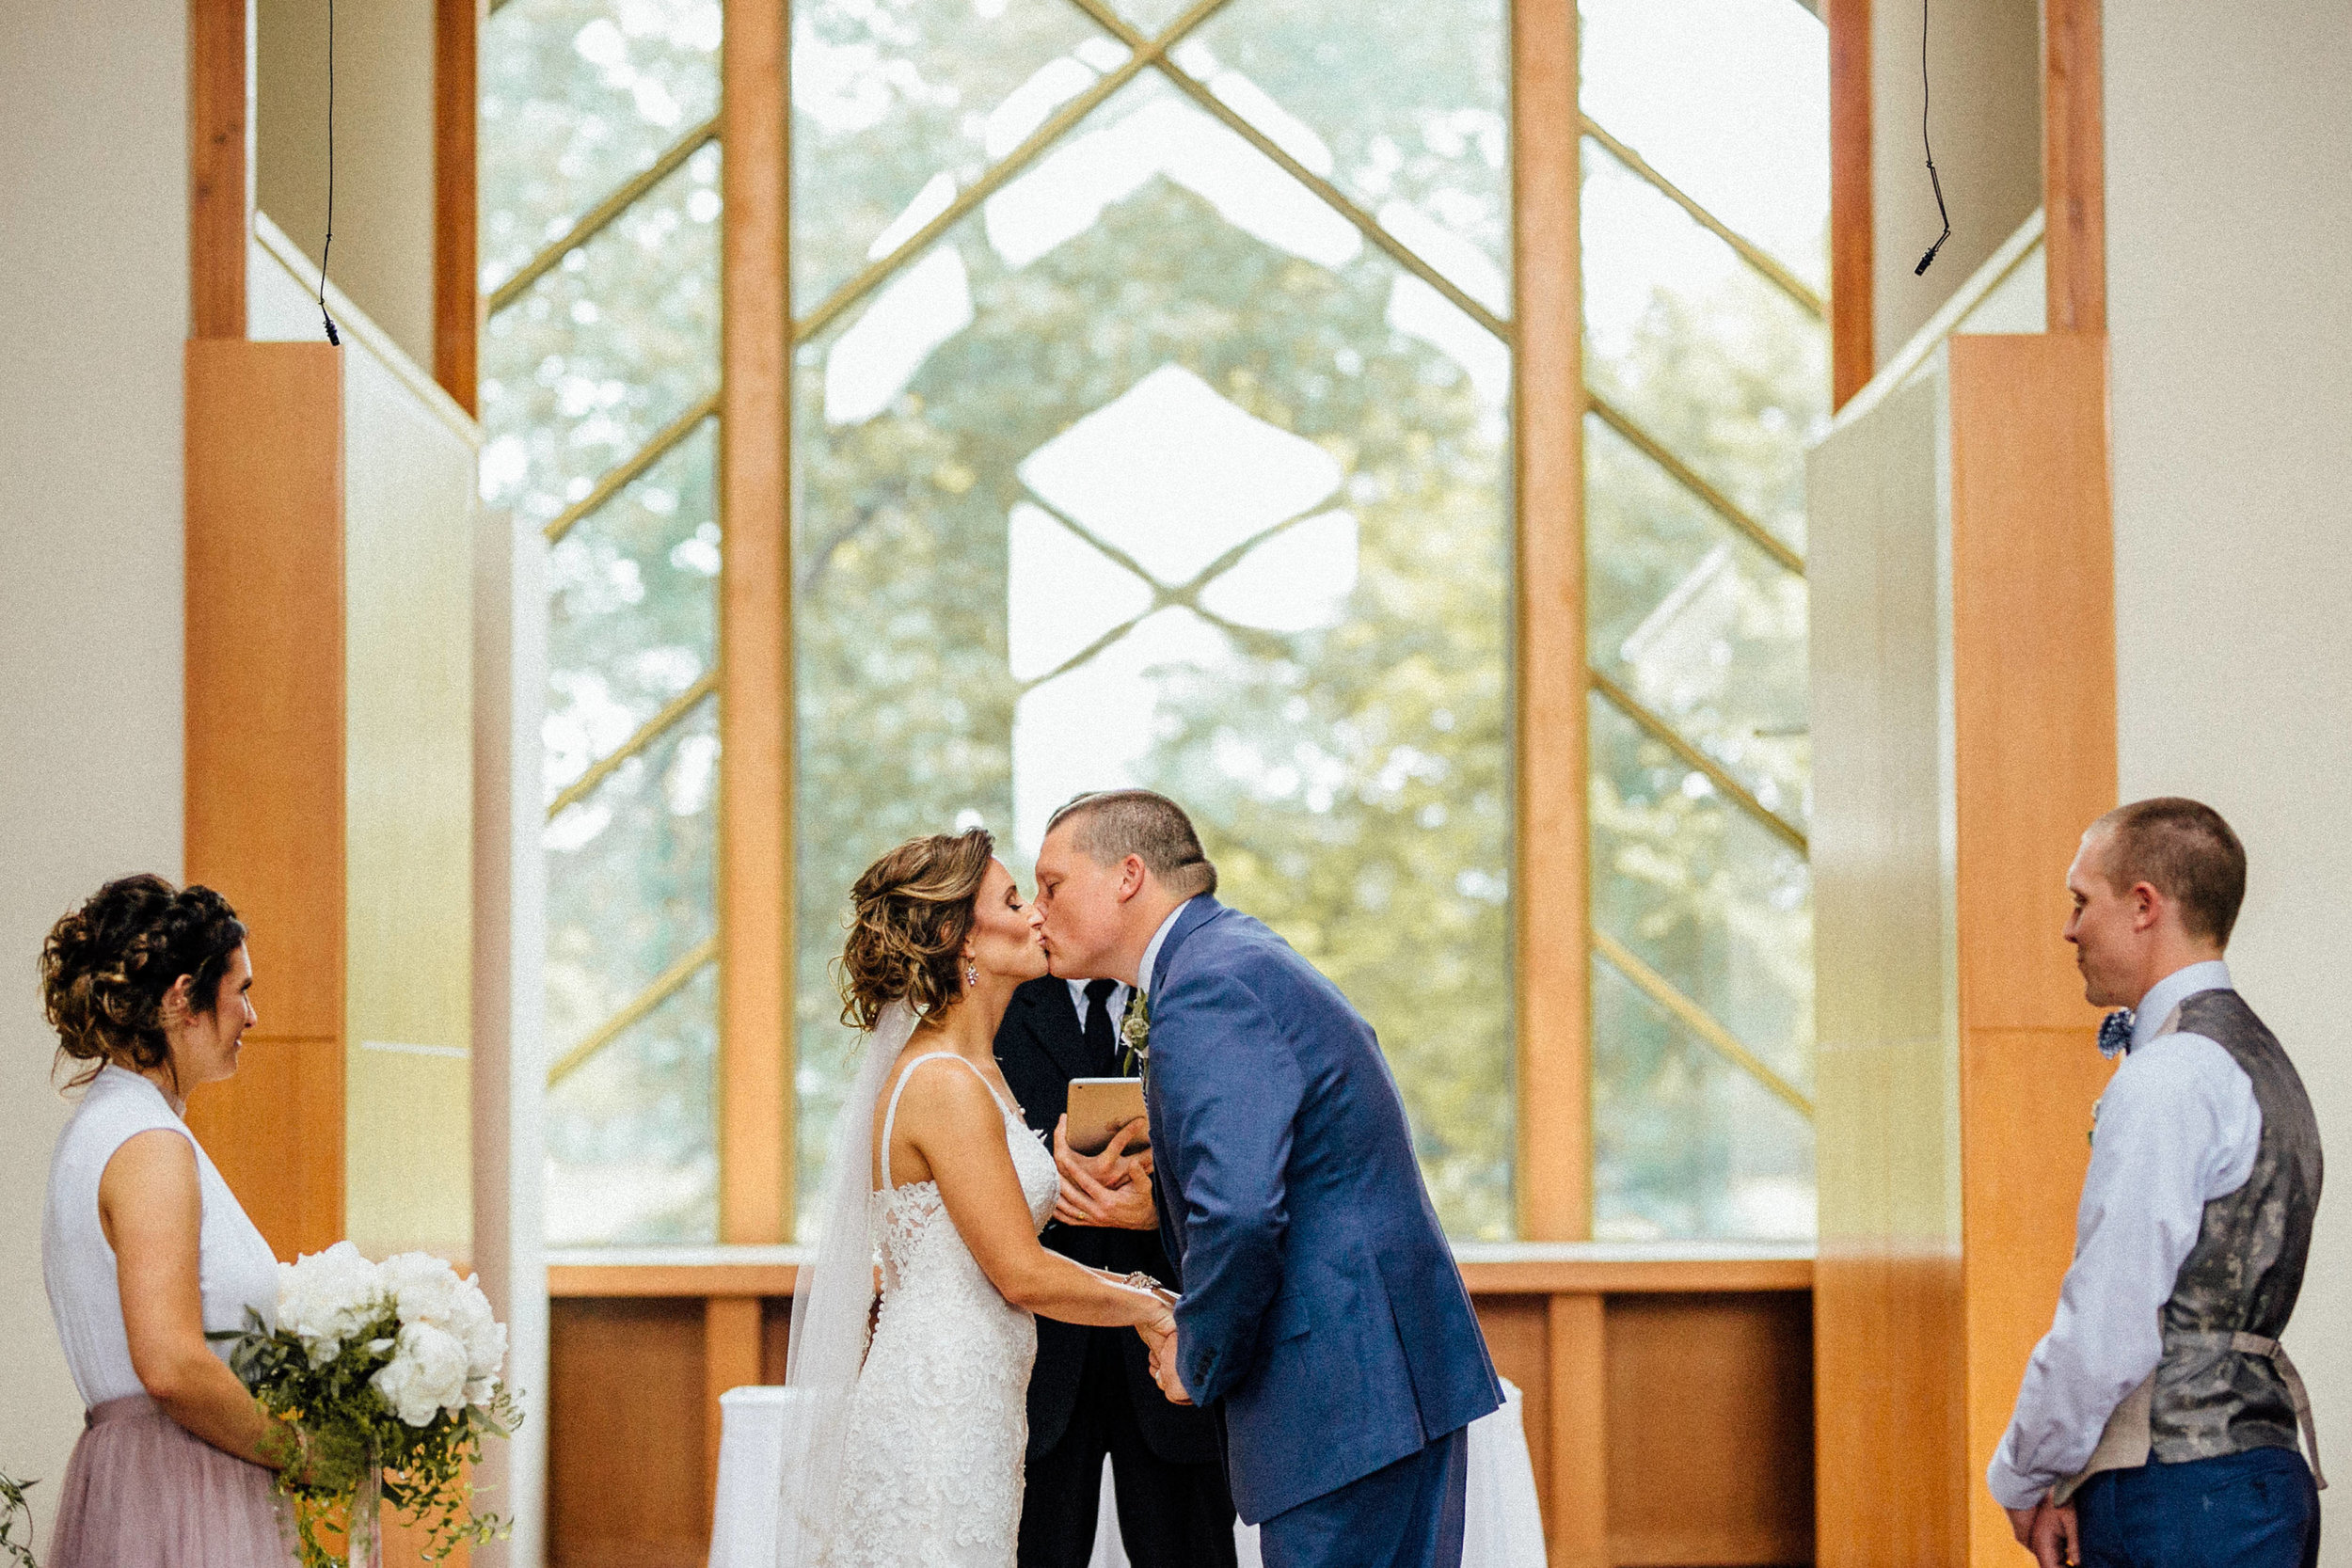 Whitney-Kevin-Ceremony-Michigan-Wedding-Photographer-76.jpg